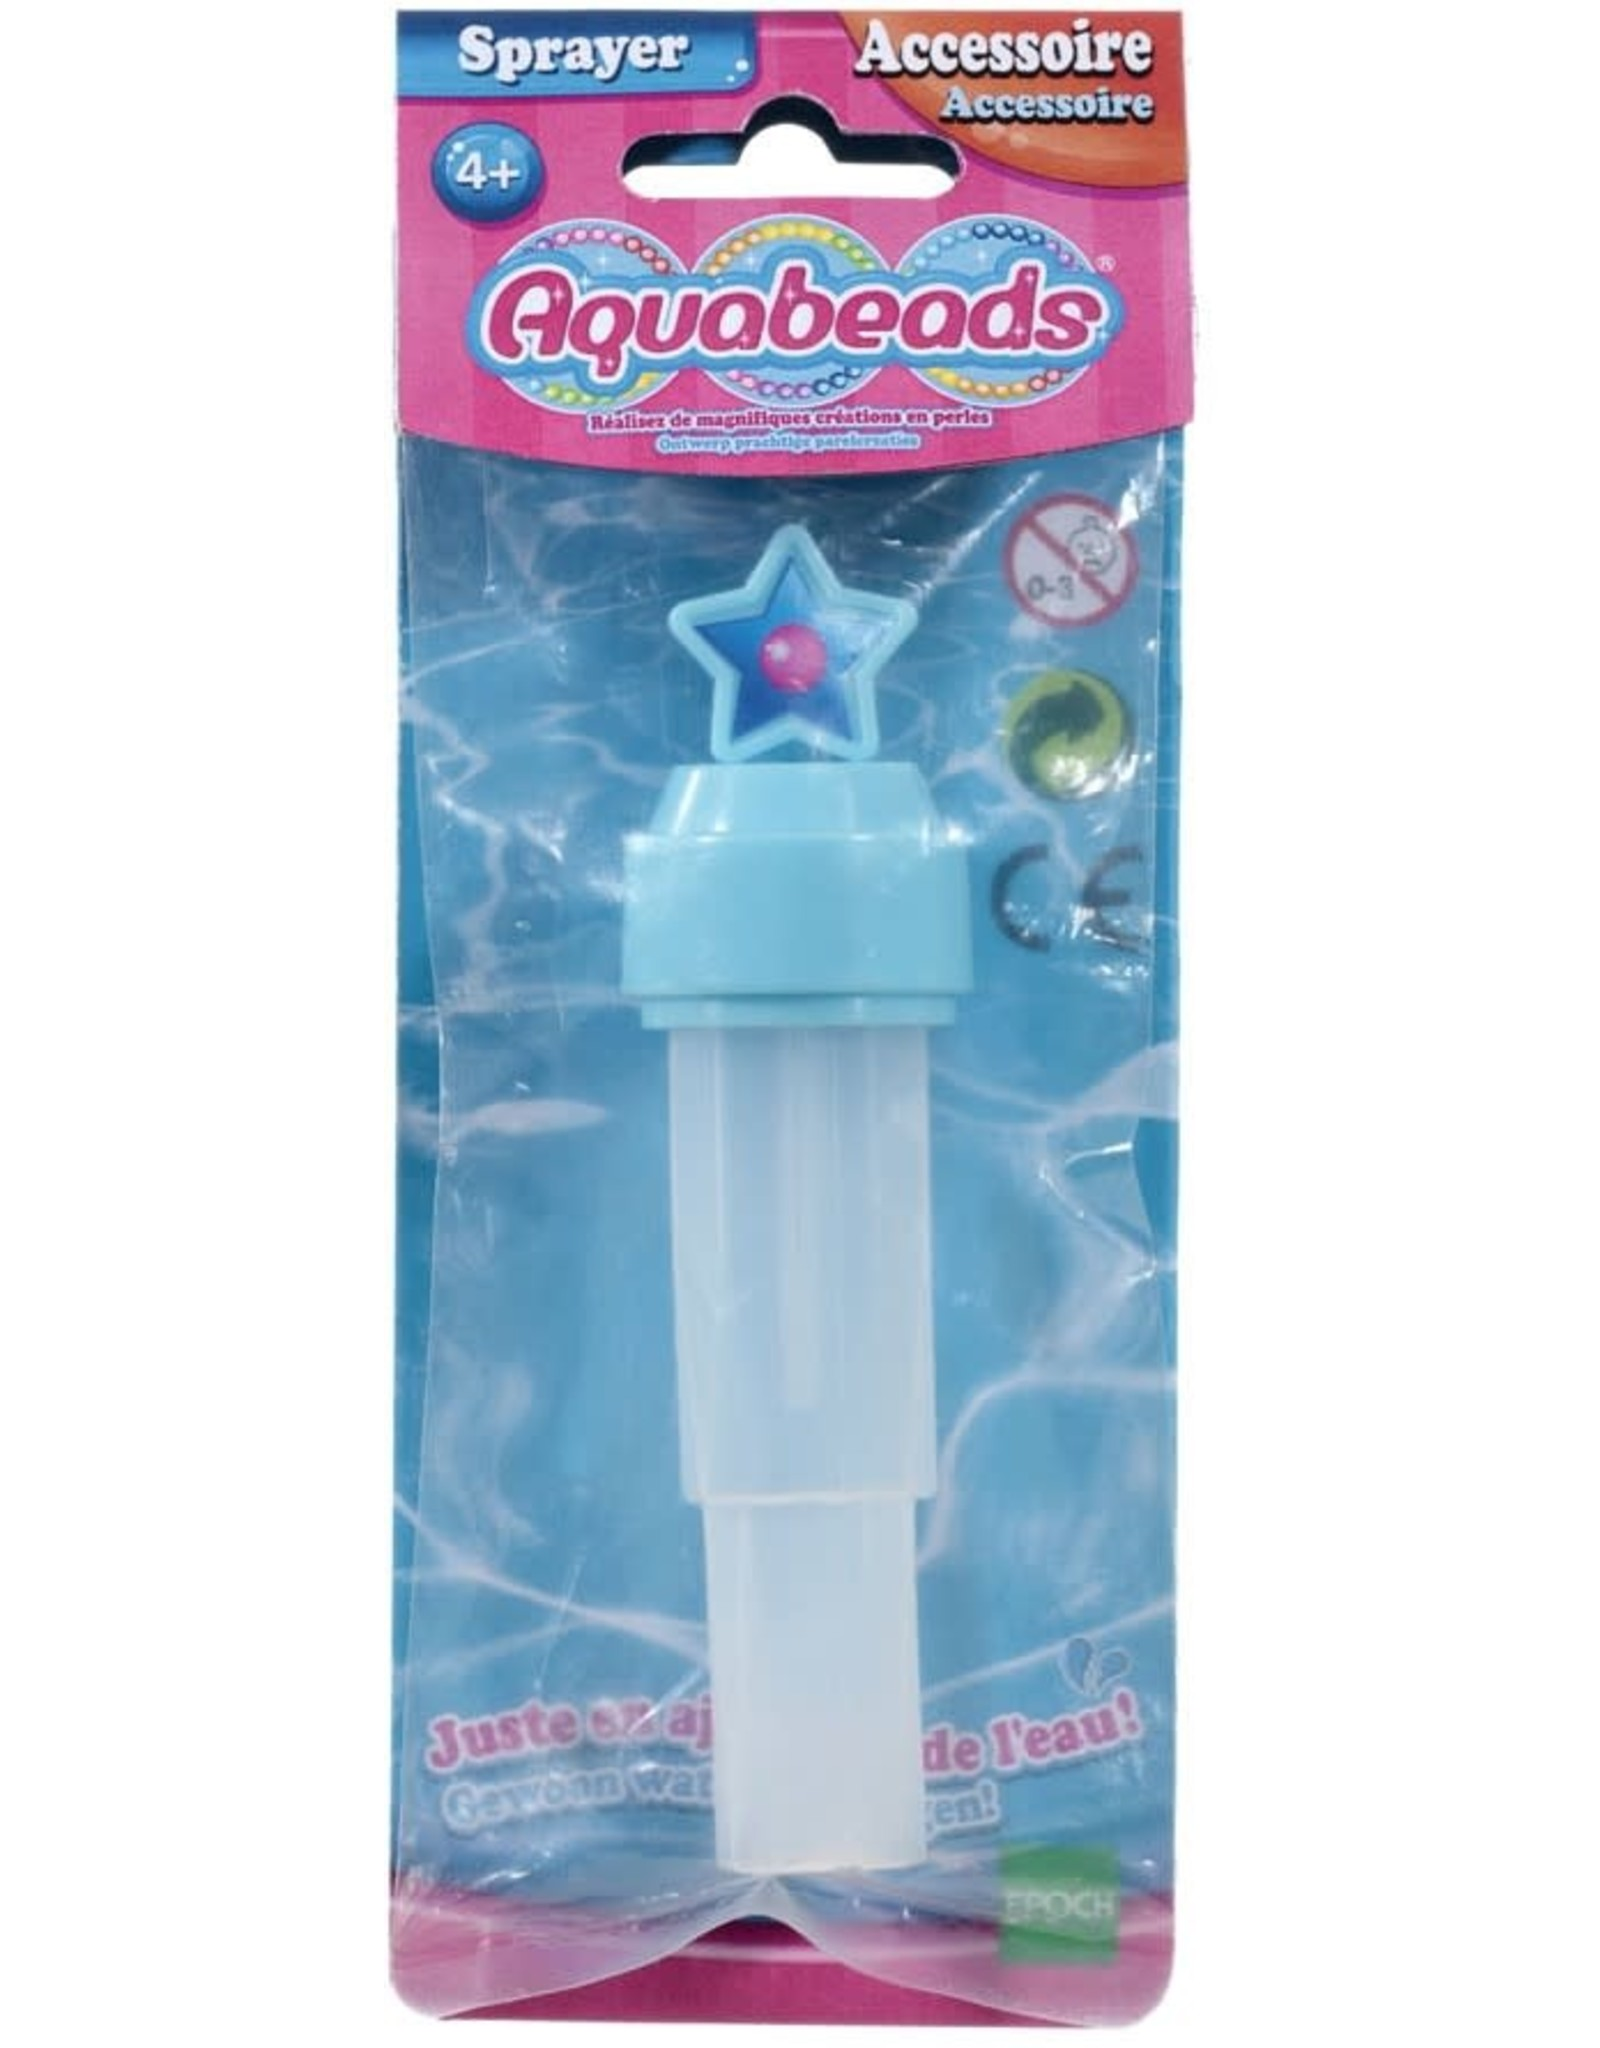 AquaBeads sproeier 31279